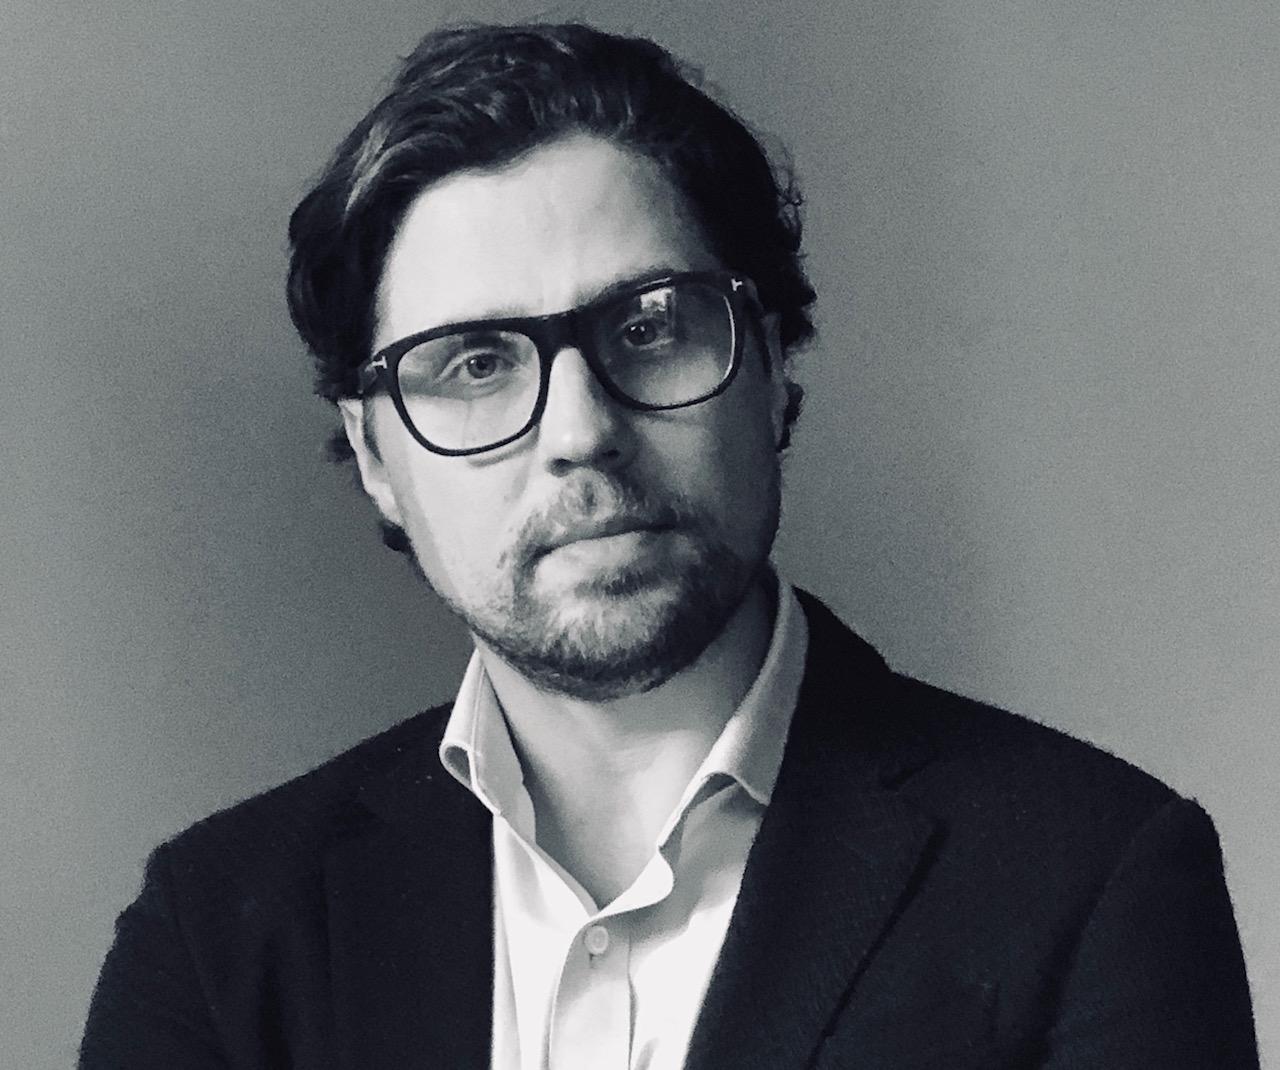 Aleksandr Kuboskin